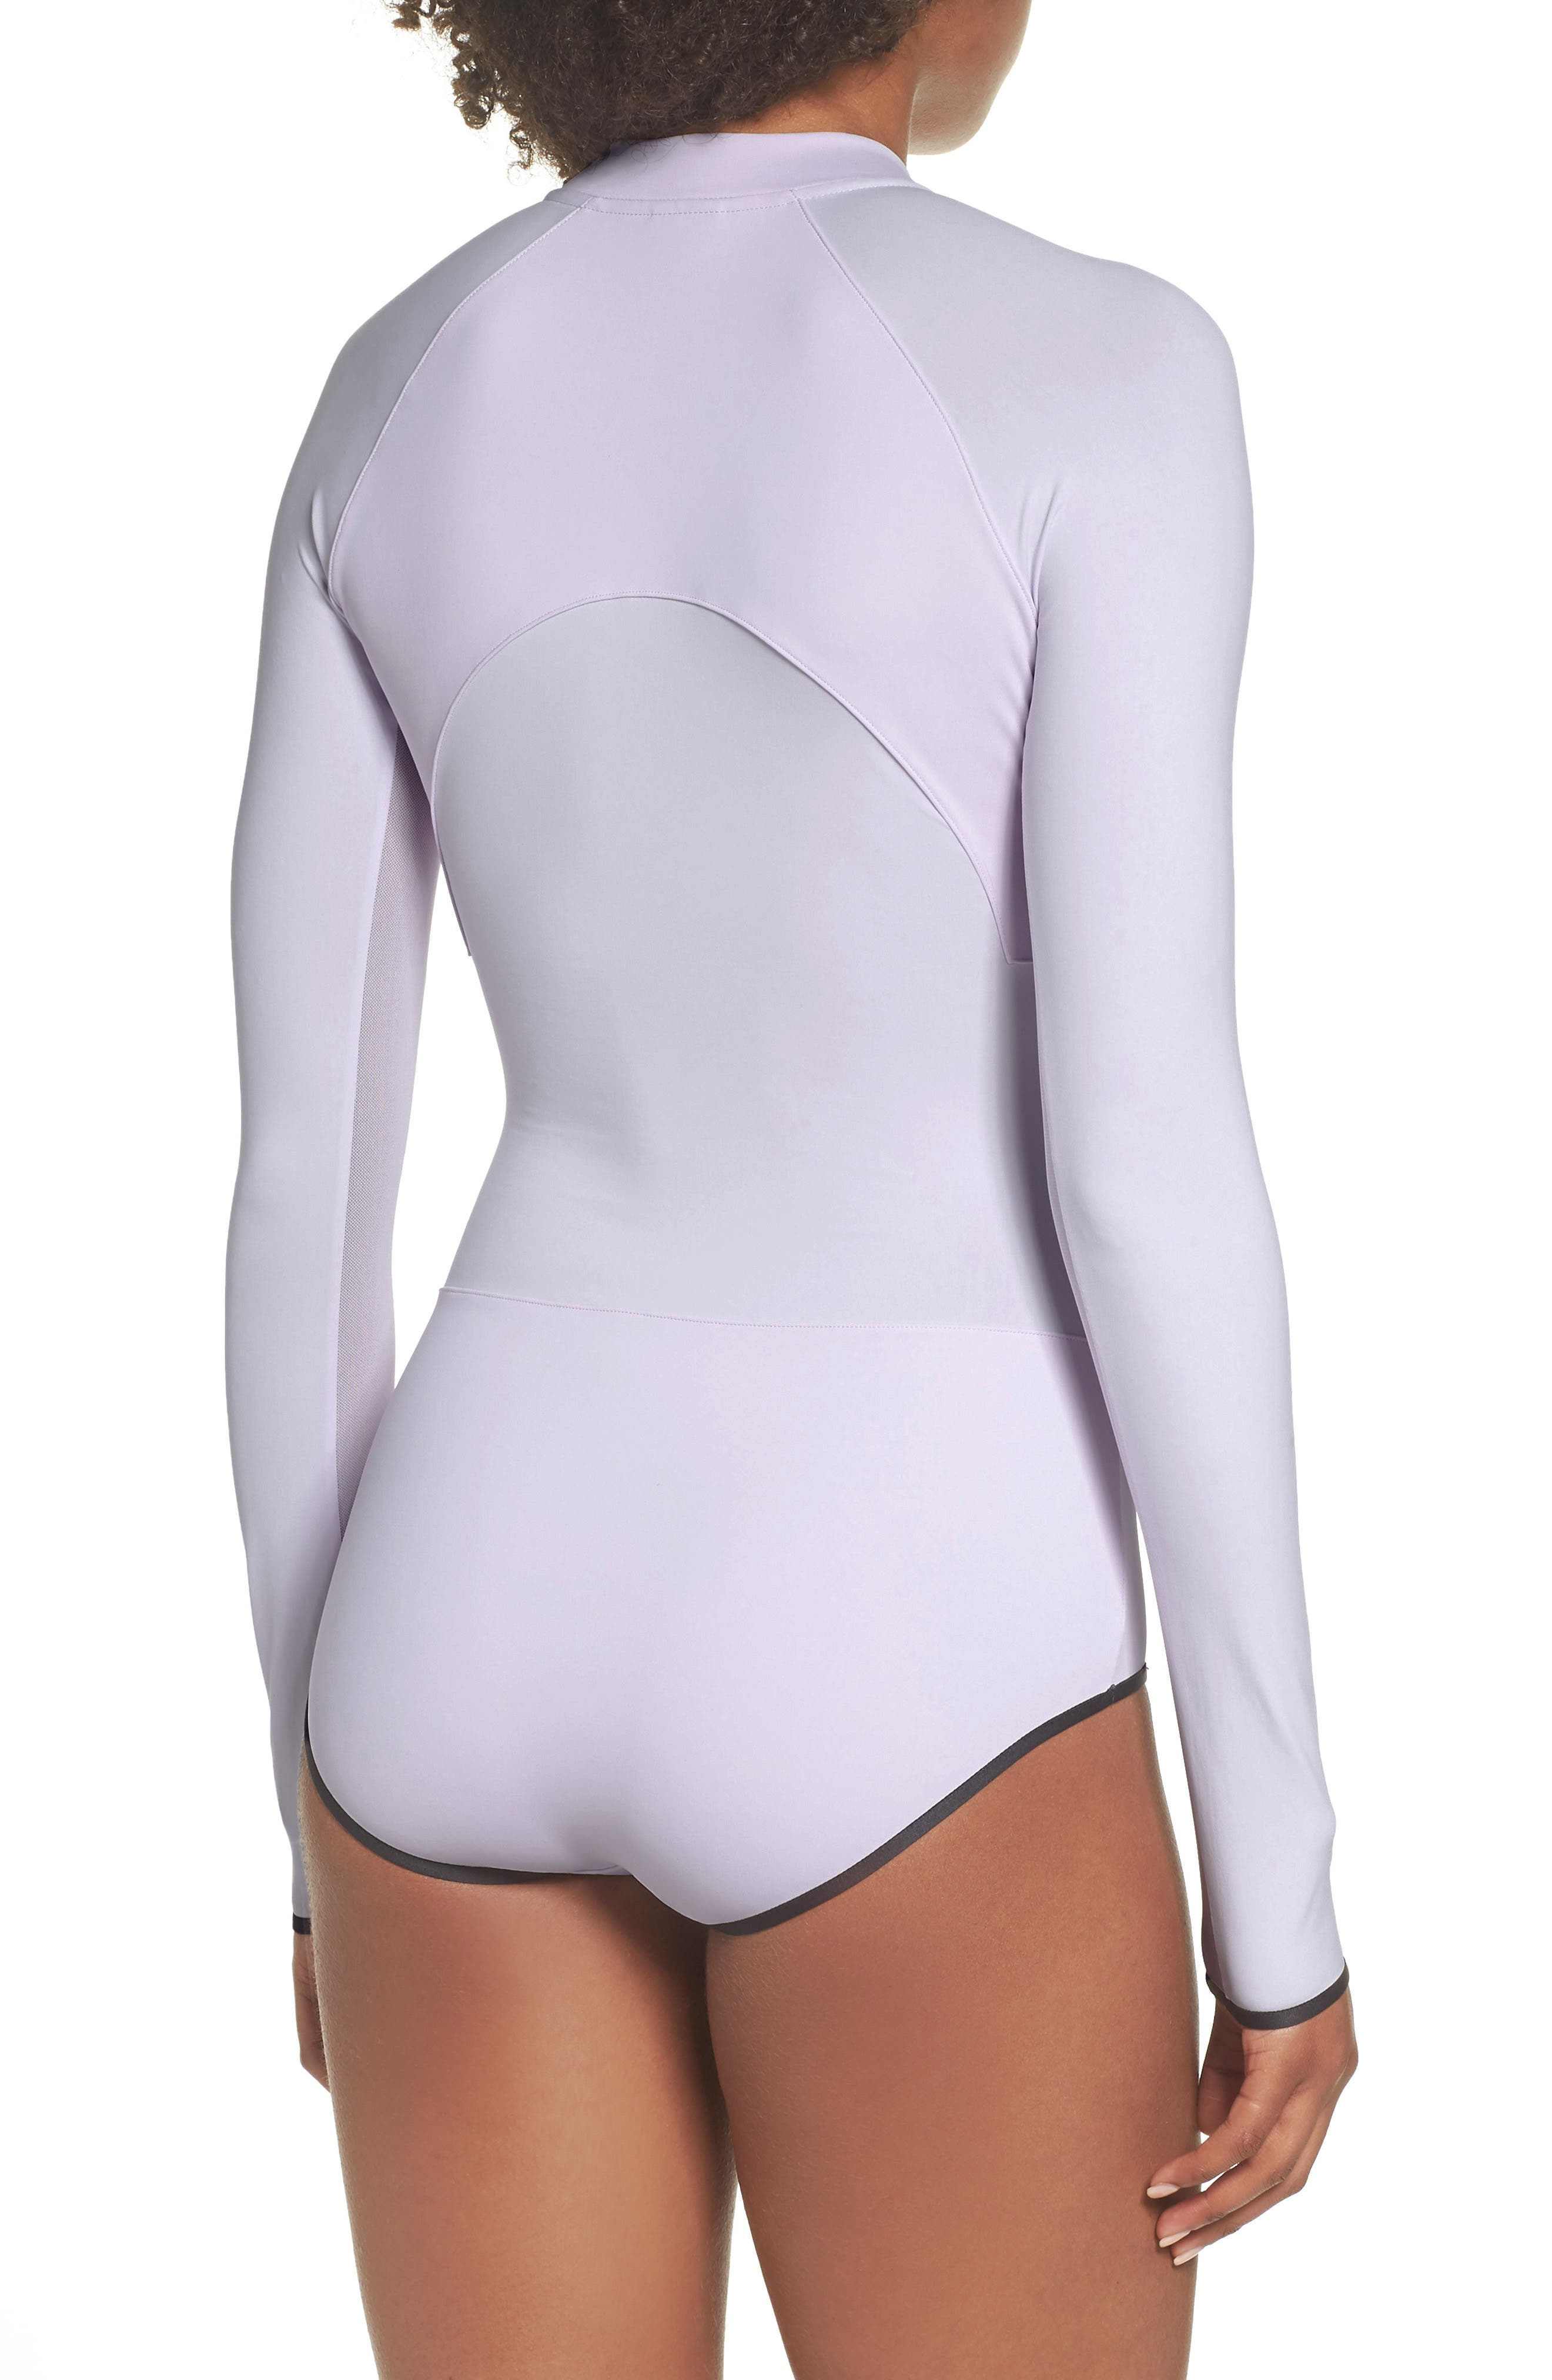 NRG Women's Dri-FIT Long Sleeve Bodysuit,                             Alternate thumbnail 3, color,                             509